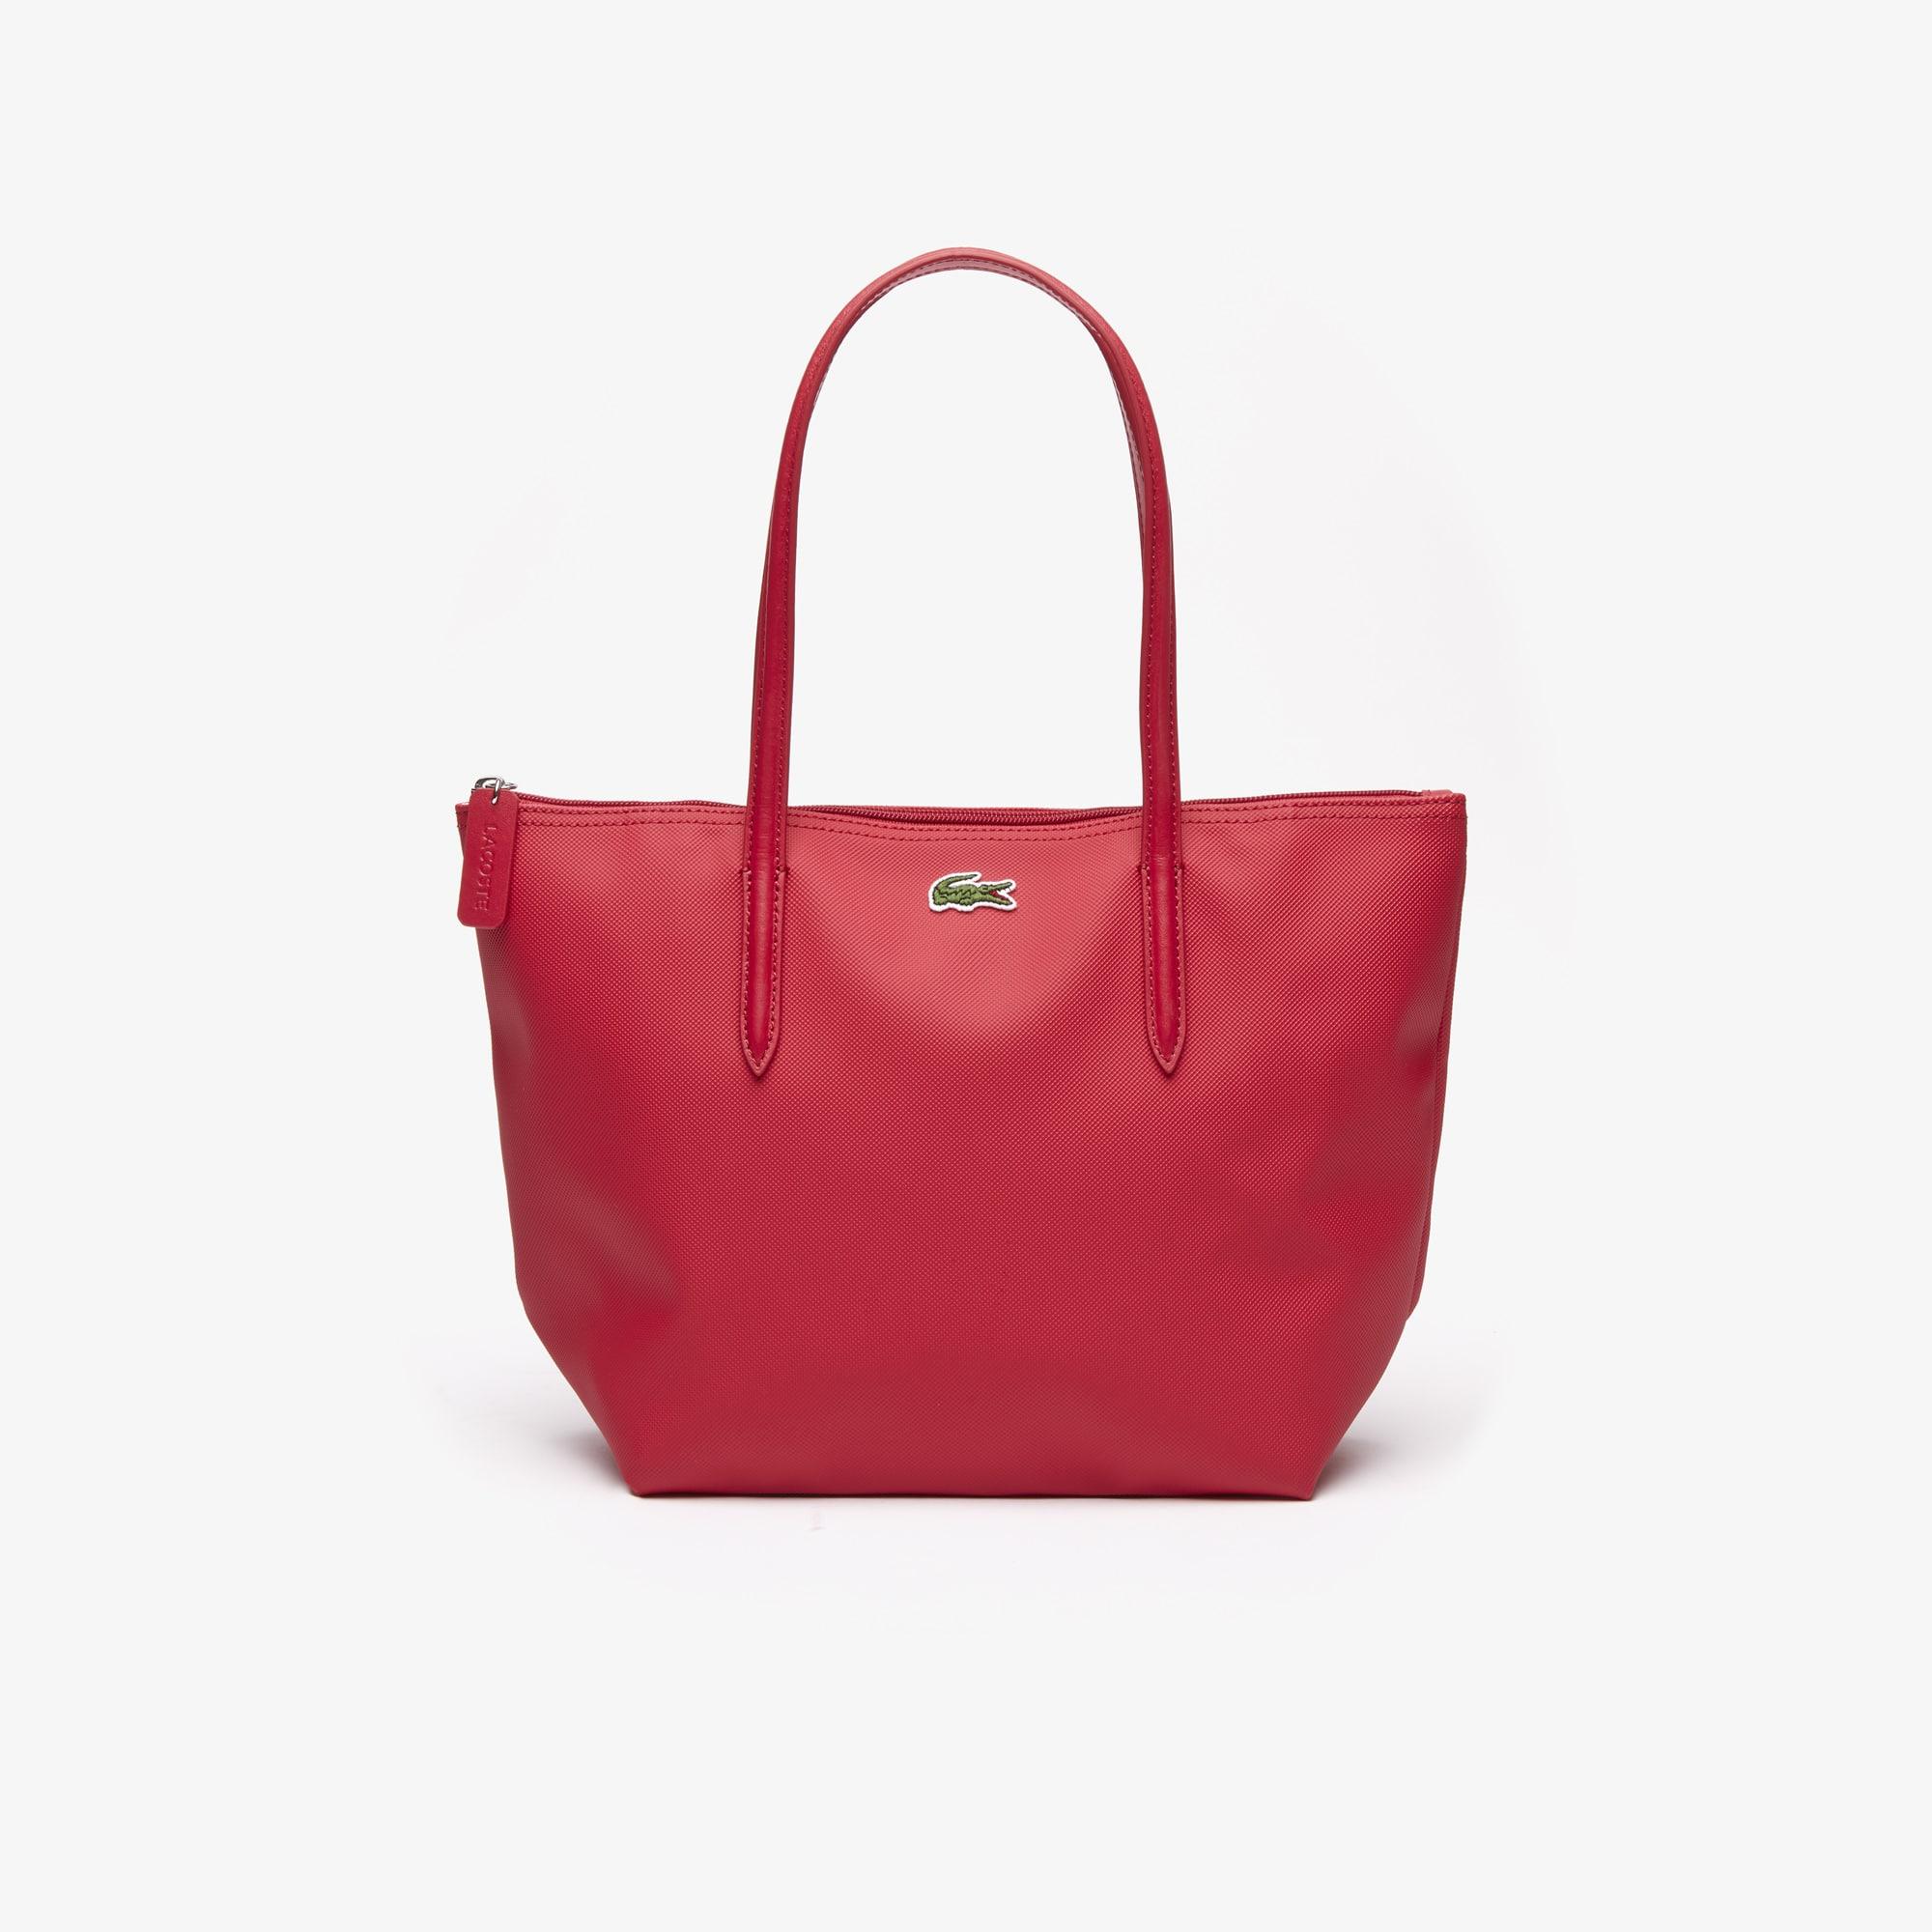 Women's L.12.12 Concept Small Zip Tote Bag